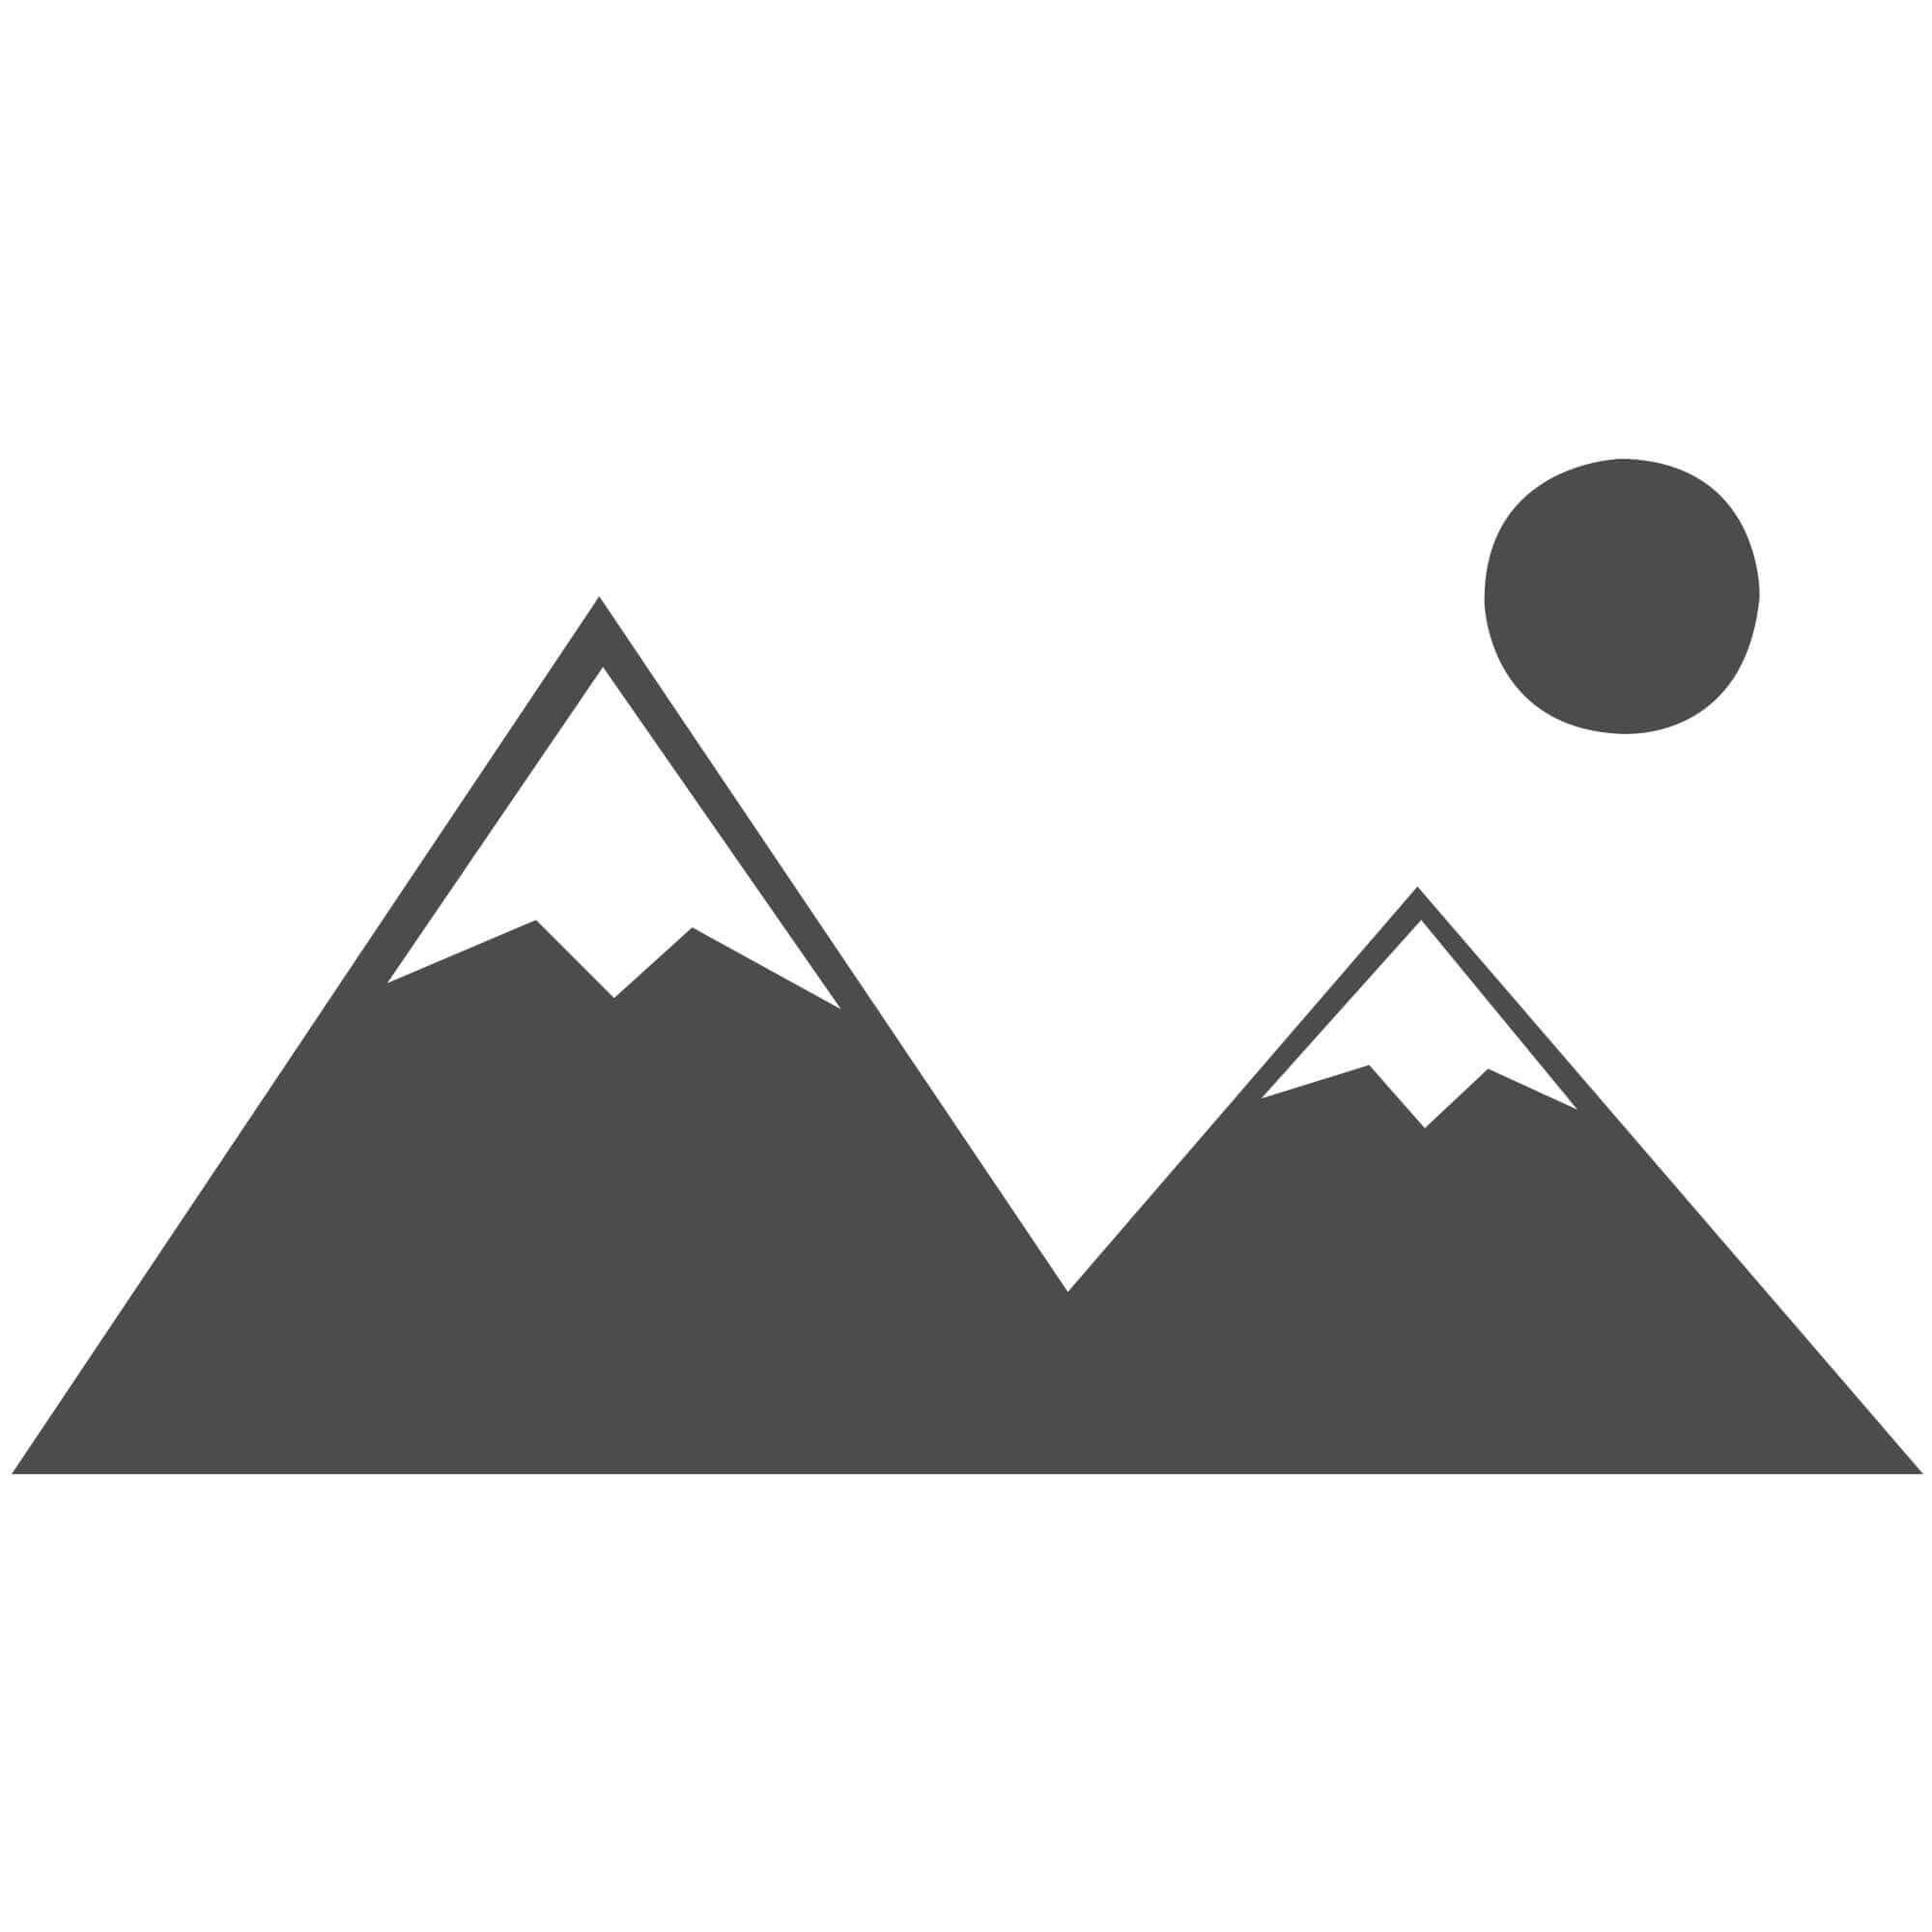 Rustic Red Brick chamber (no returns)